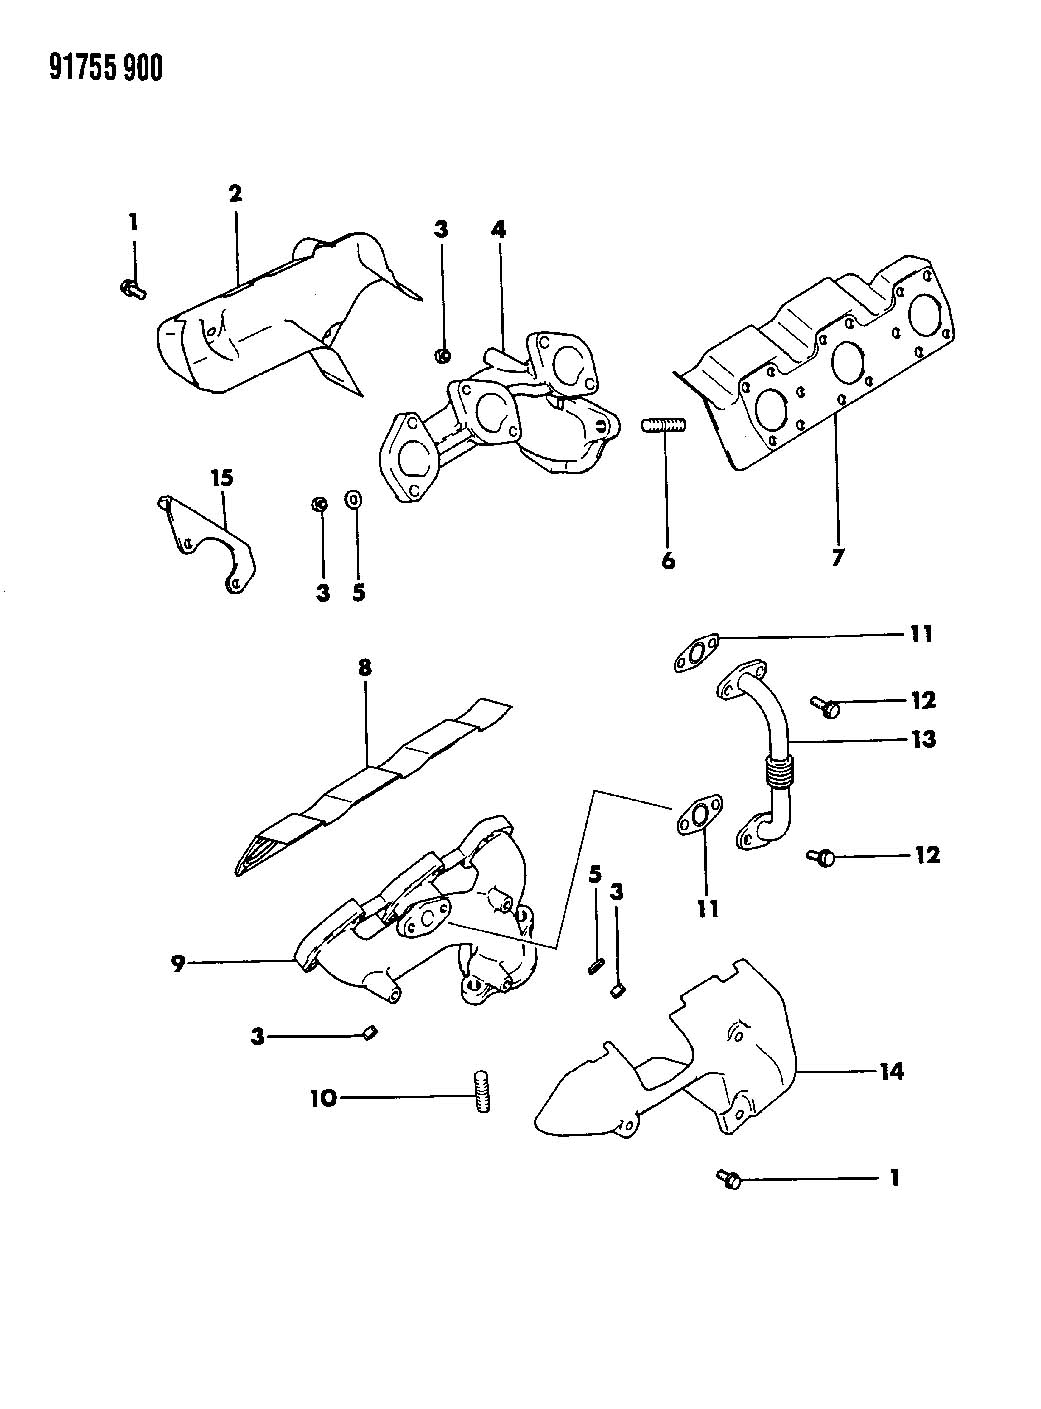 Dodge Grand Caravan Nut. Catalytic convertor. Inject, ohd